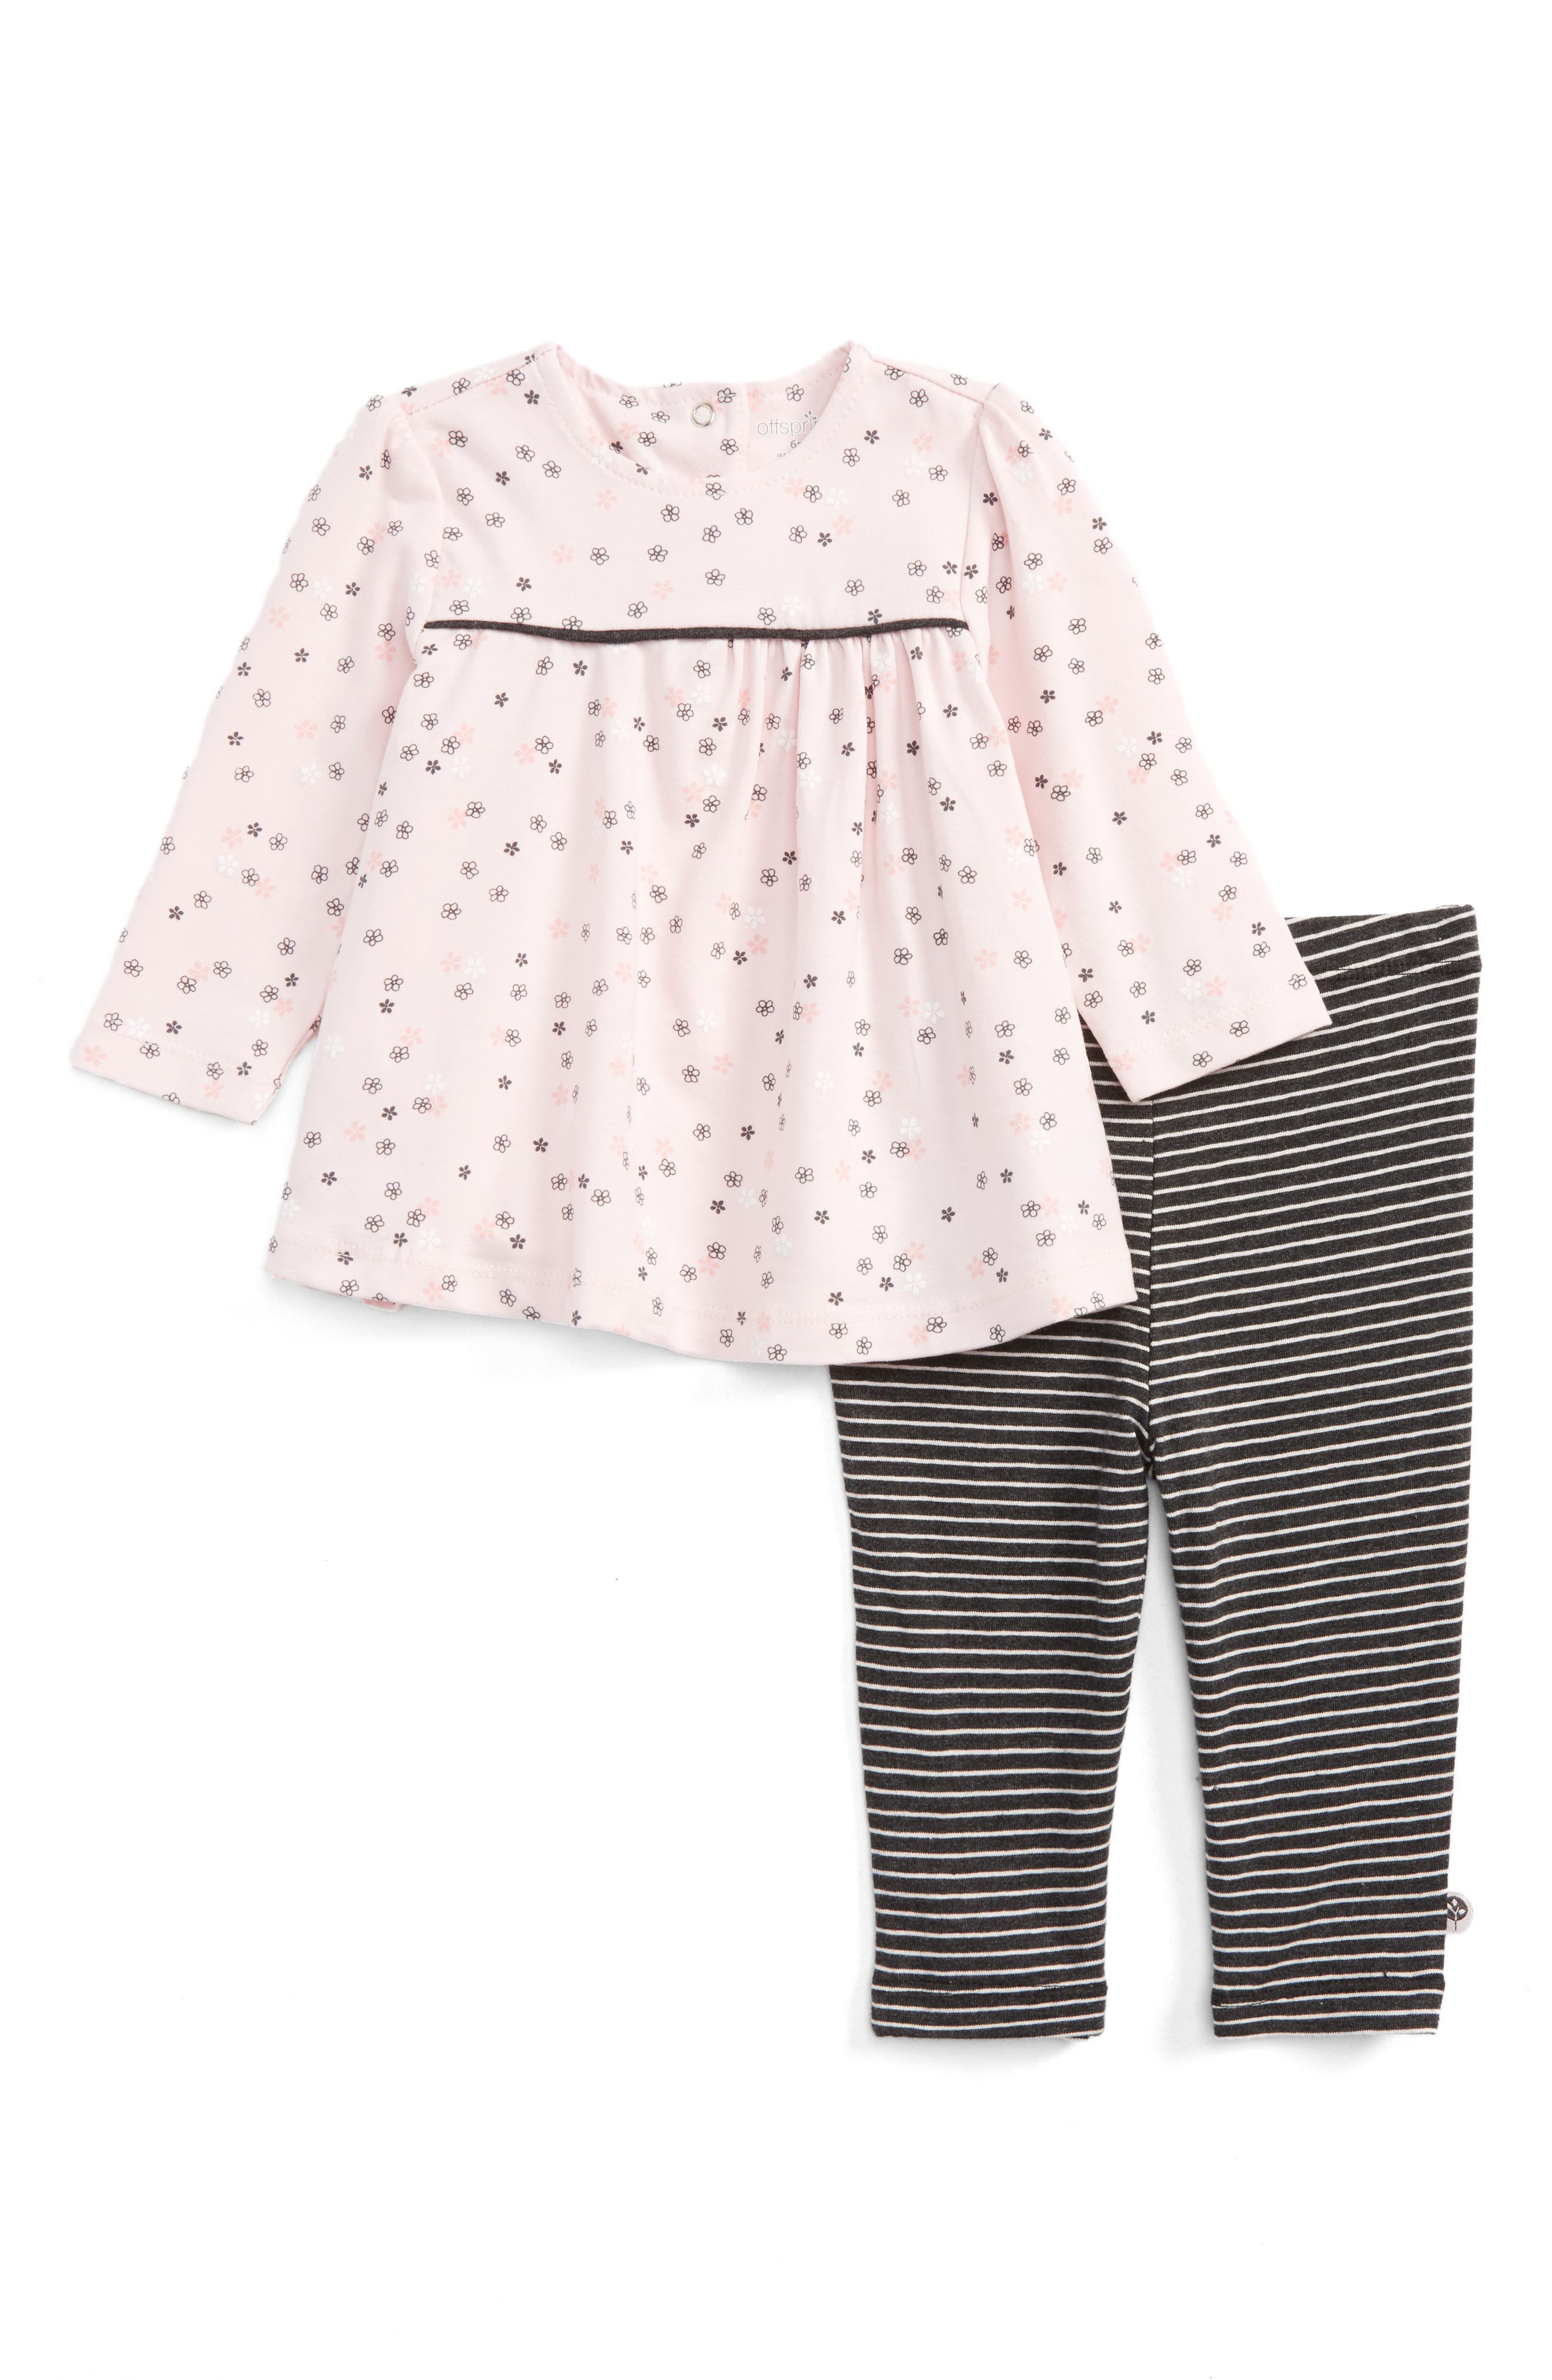 Delicate Blush Tunic & Leggings Set,                         Main,                         color, 699